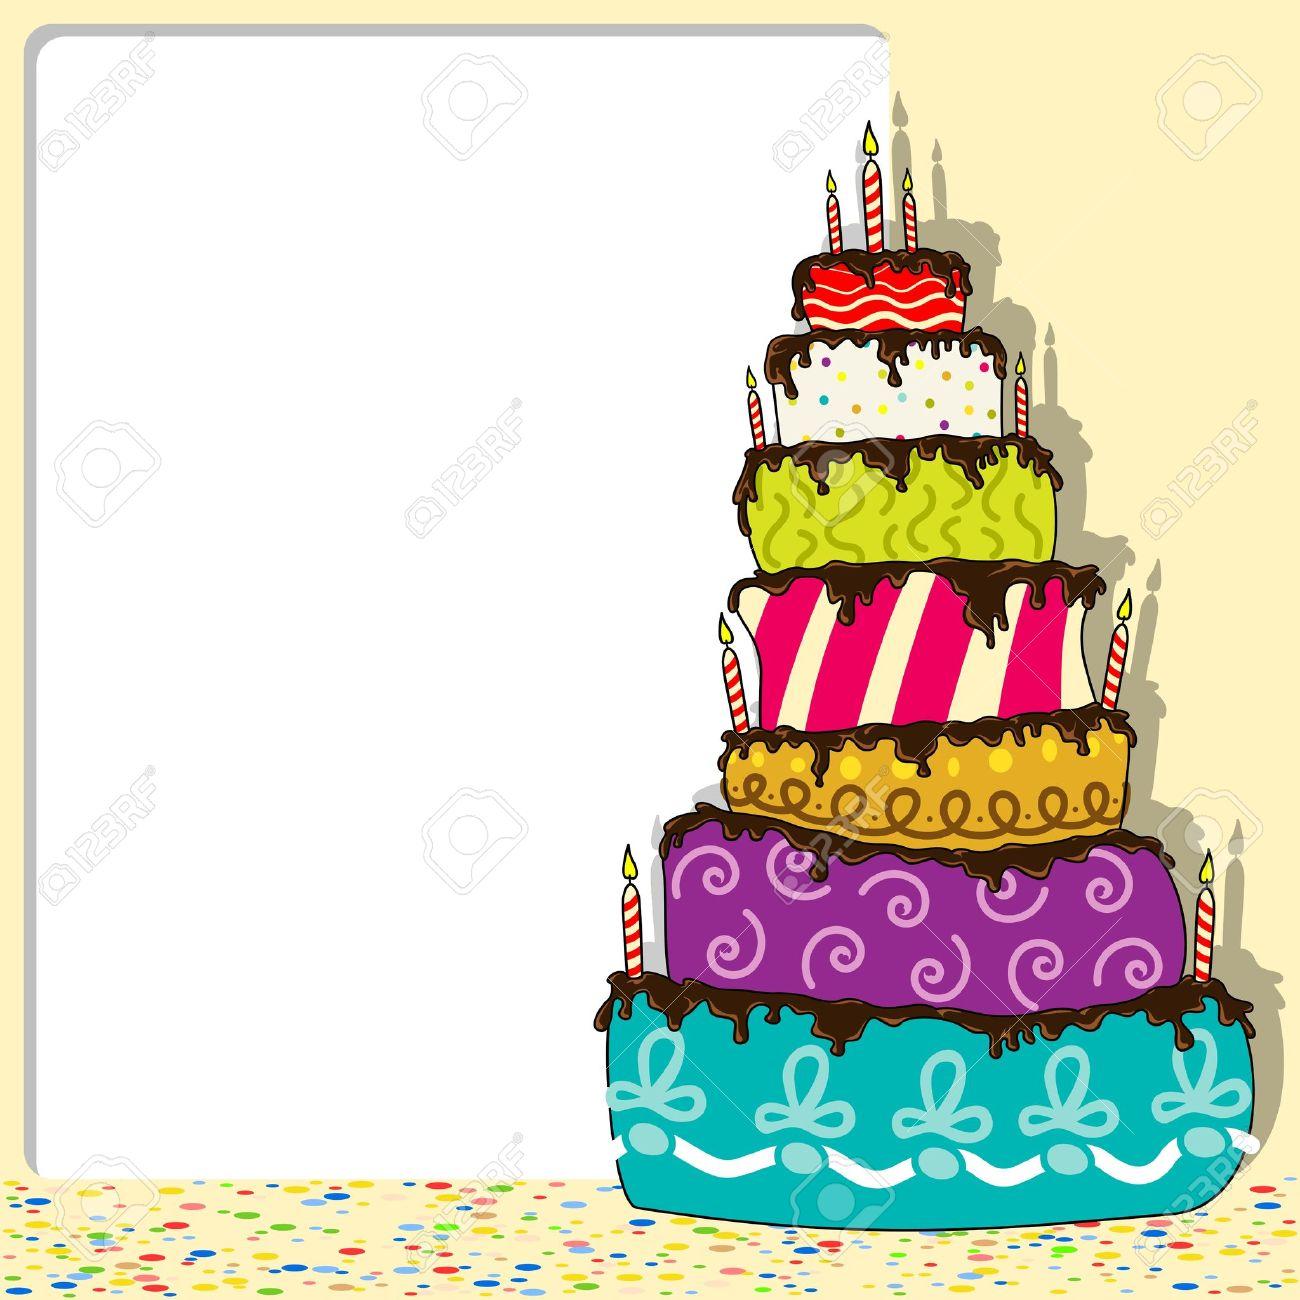 Birthday Cake - Celebration Background Illustration